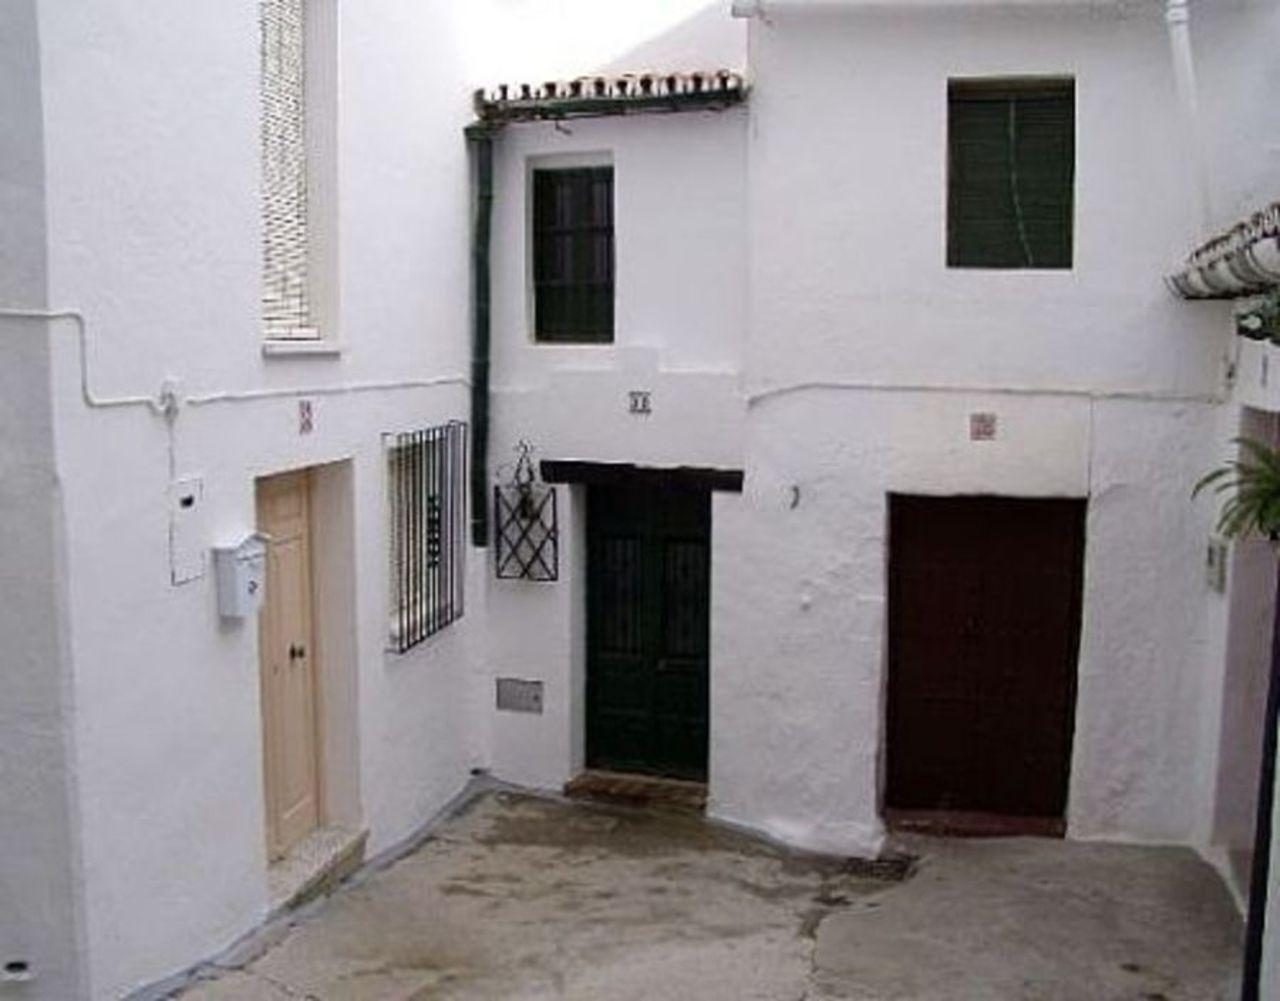 Arroyo de Casarabonela Spain